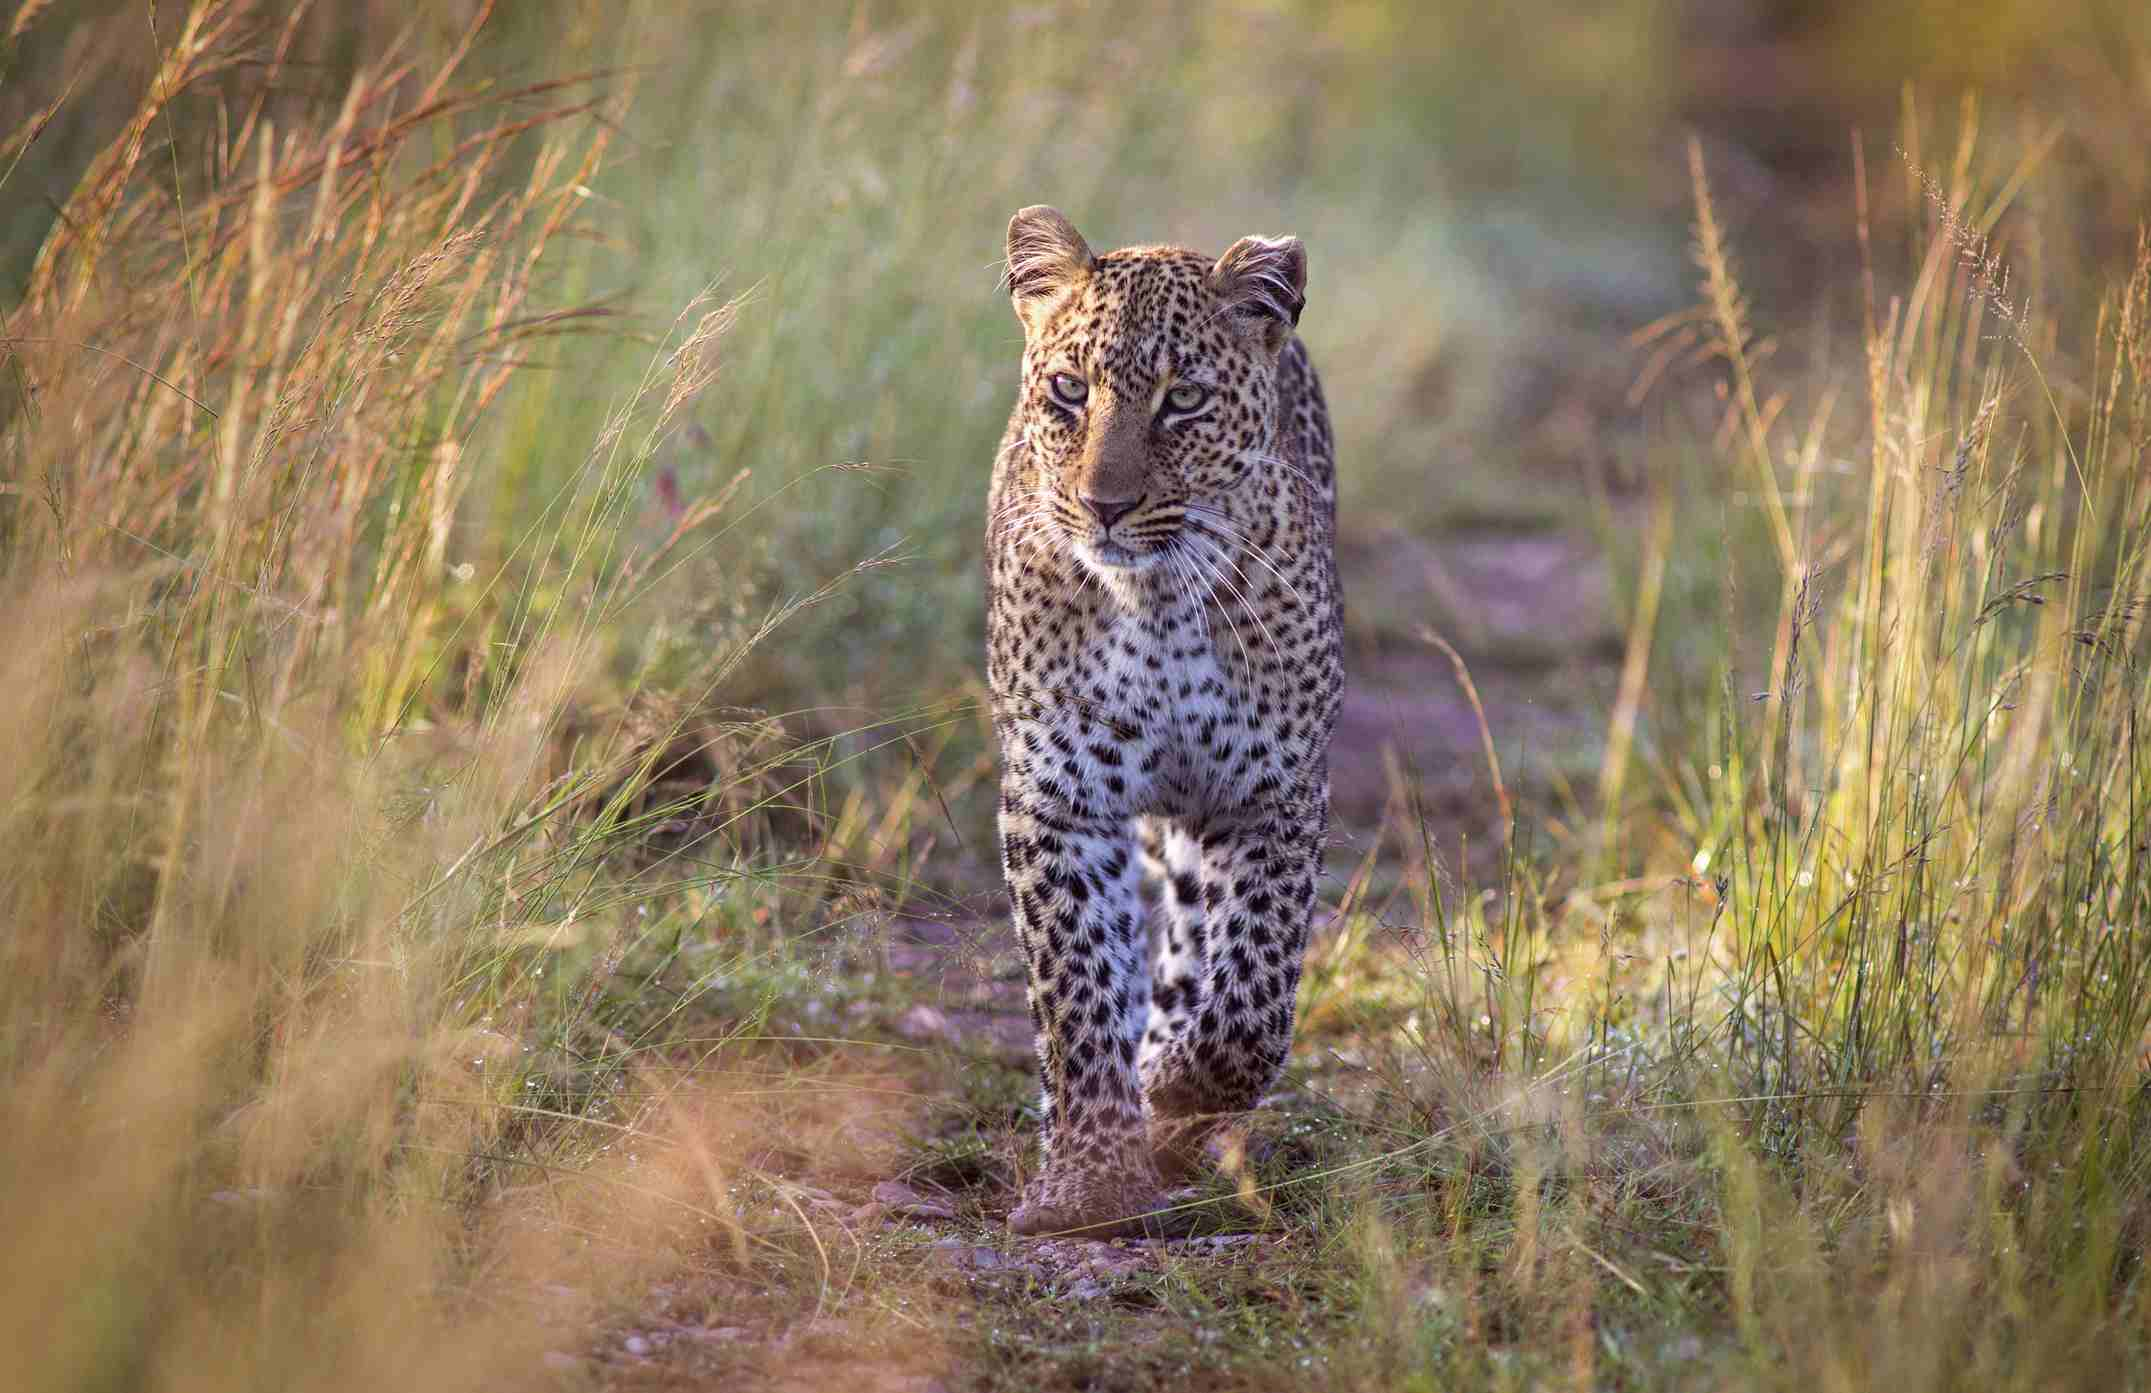 Female leopard, Maasai Mara National Reserve